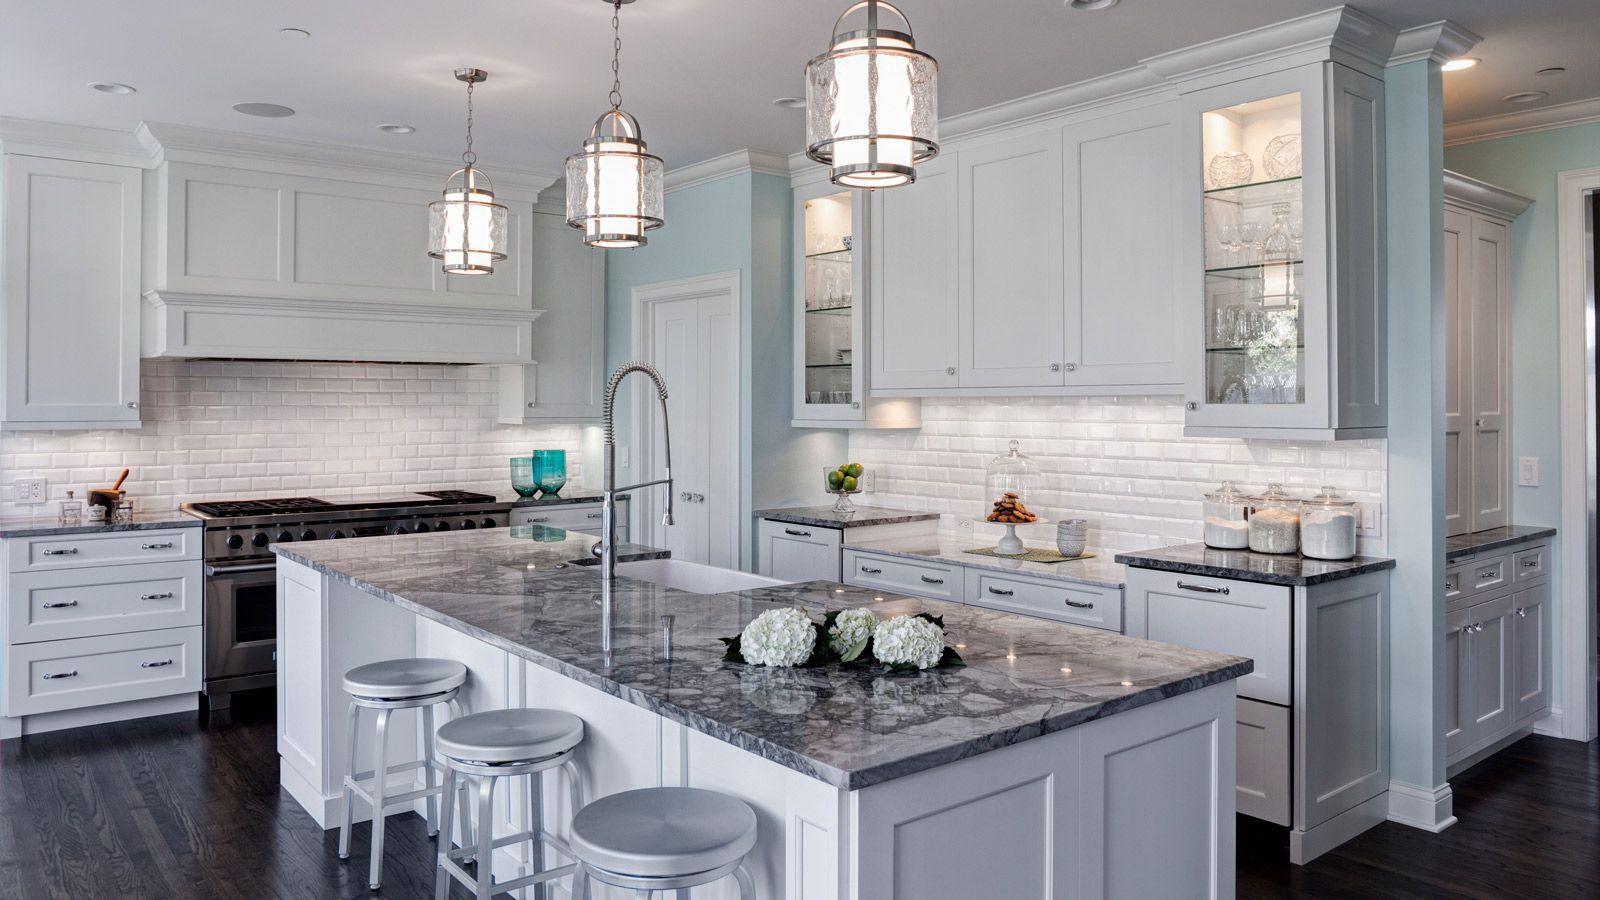 Island White Fantasy Granite Also Know As Aranascato Specialty Stone Light Grey Kitchens Grey Kitchen Island Traditional Kitchen Design